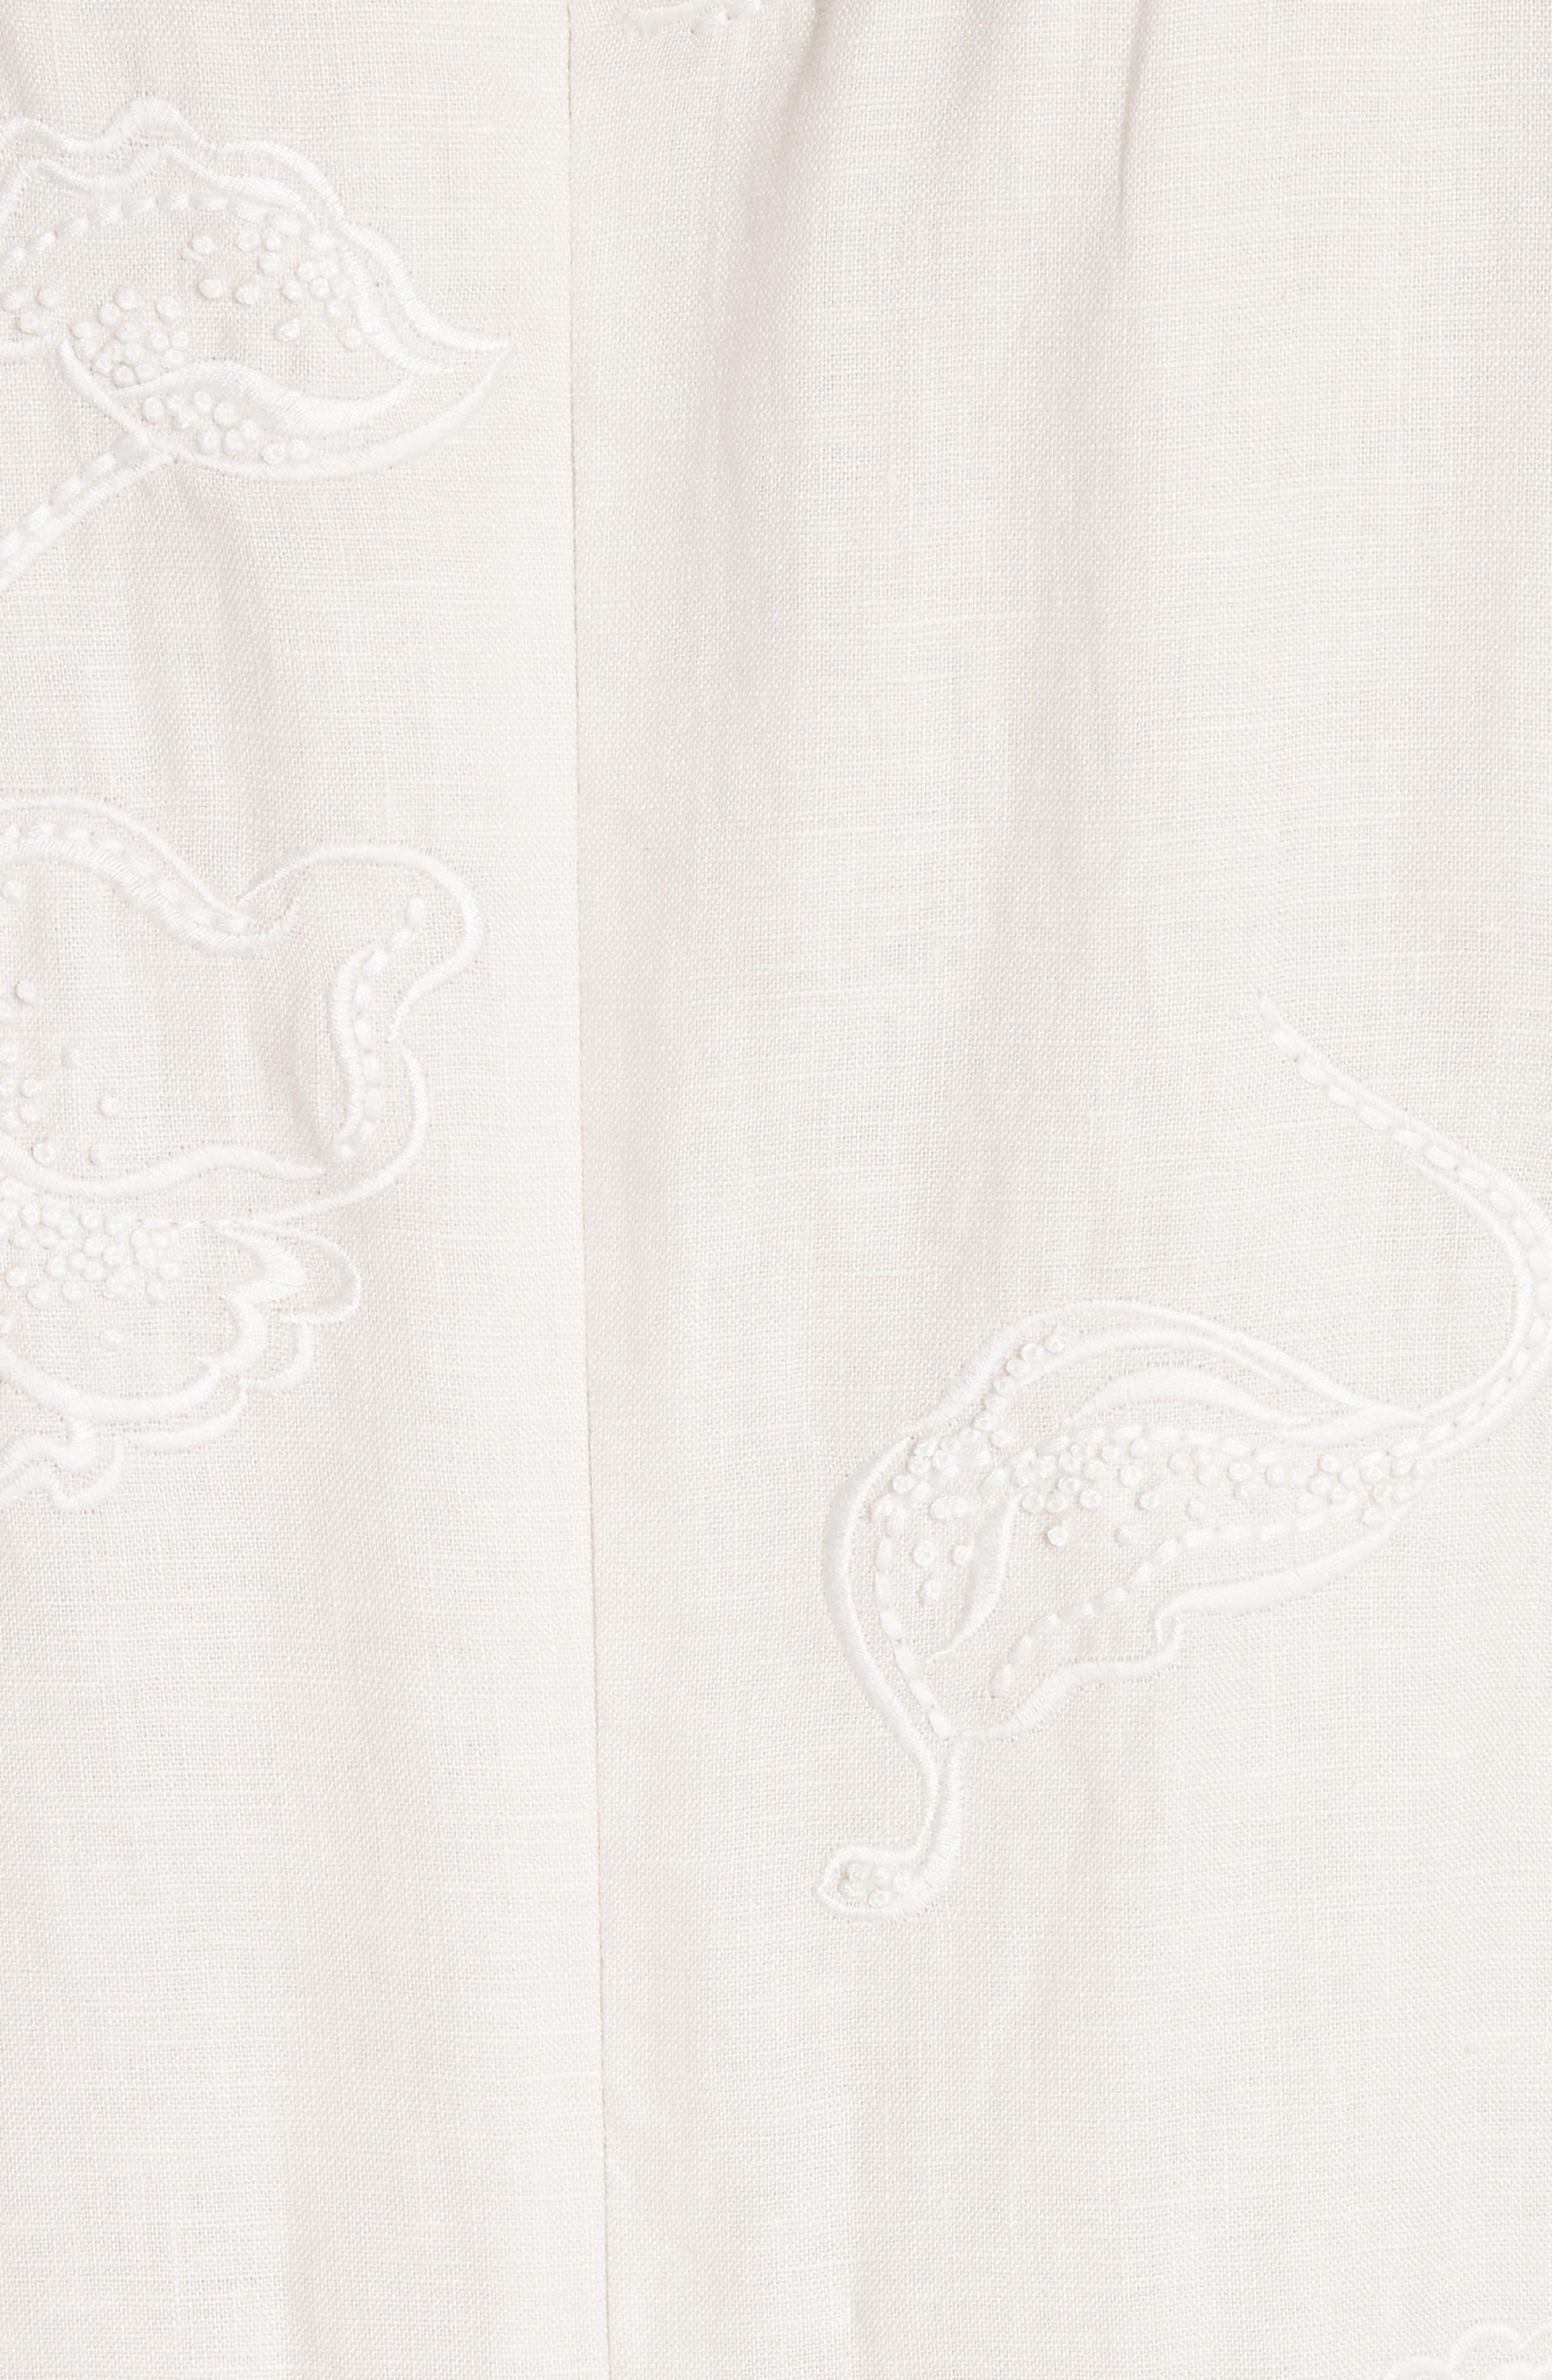 Duncan Embroidered Linen Dress,                             Alternate thumbnail 5, color,                             252